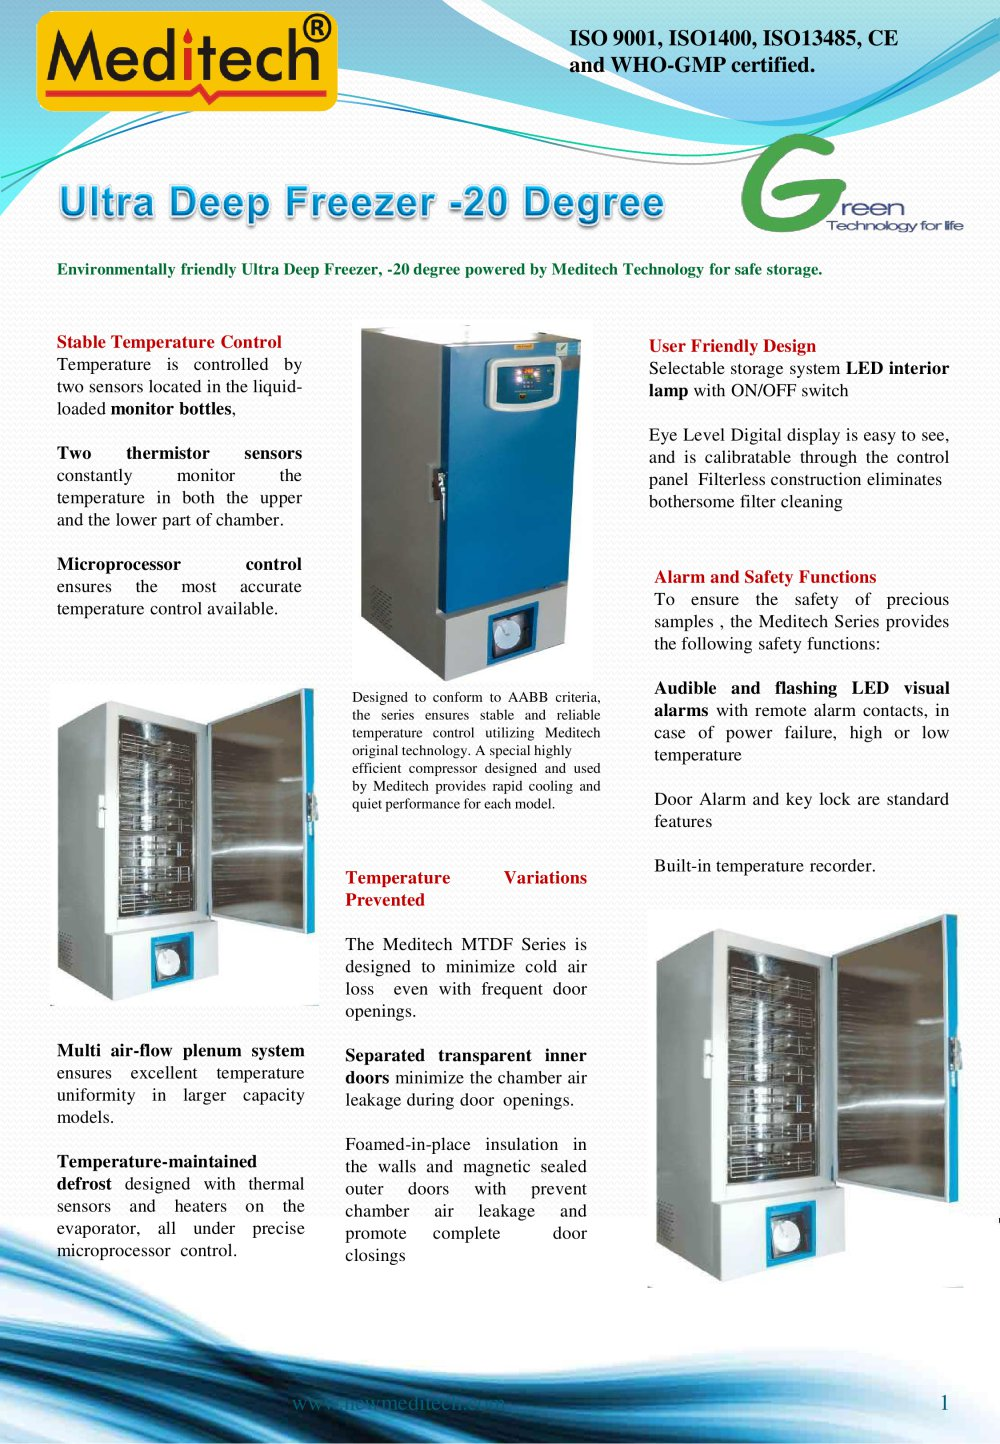 Deep Freezer 20c General Meditech Technologies India Pvt Ltd Case Circuit Breaker Mini Refrigerator Defrost Timer 1 4 Pages